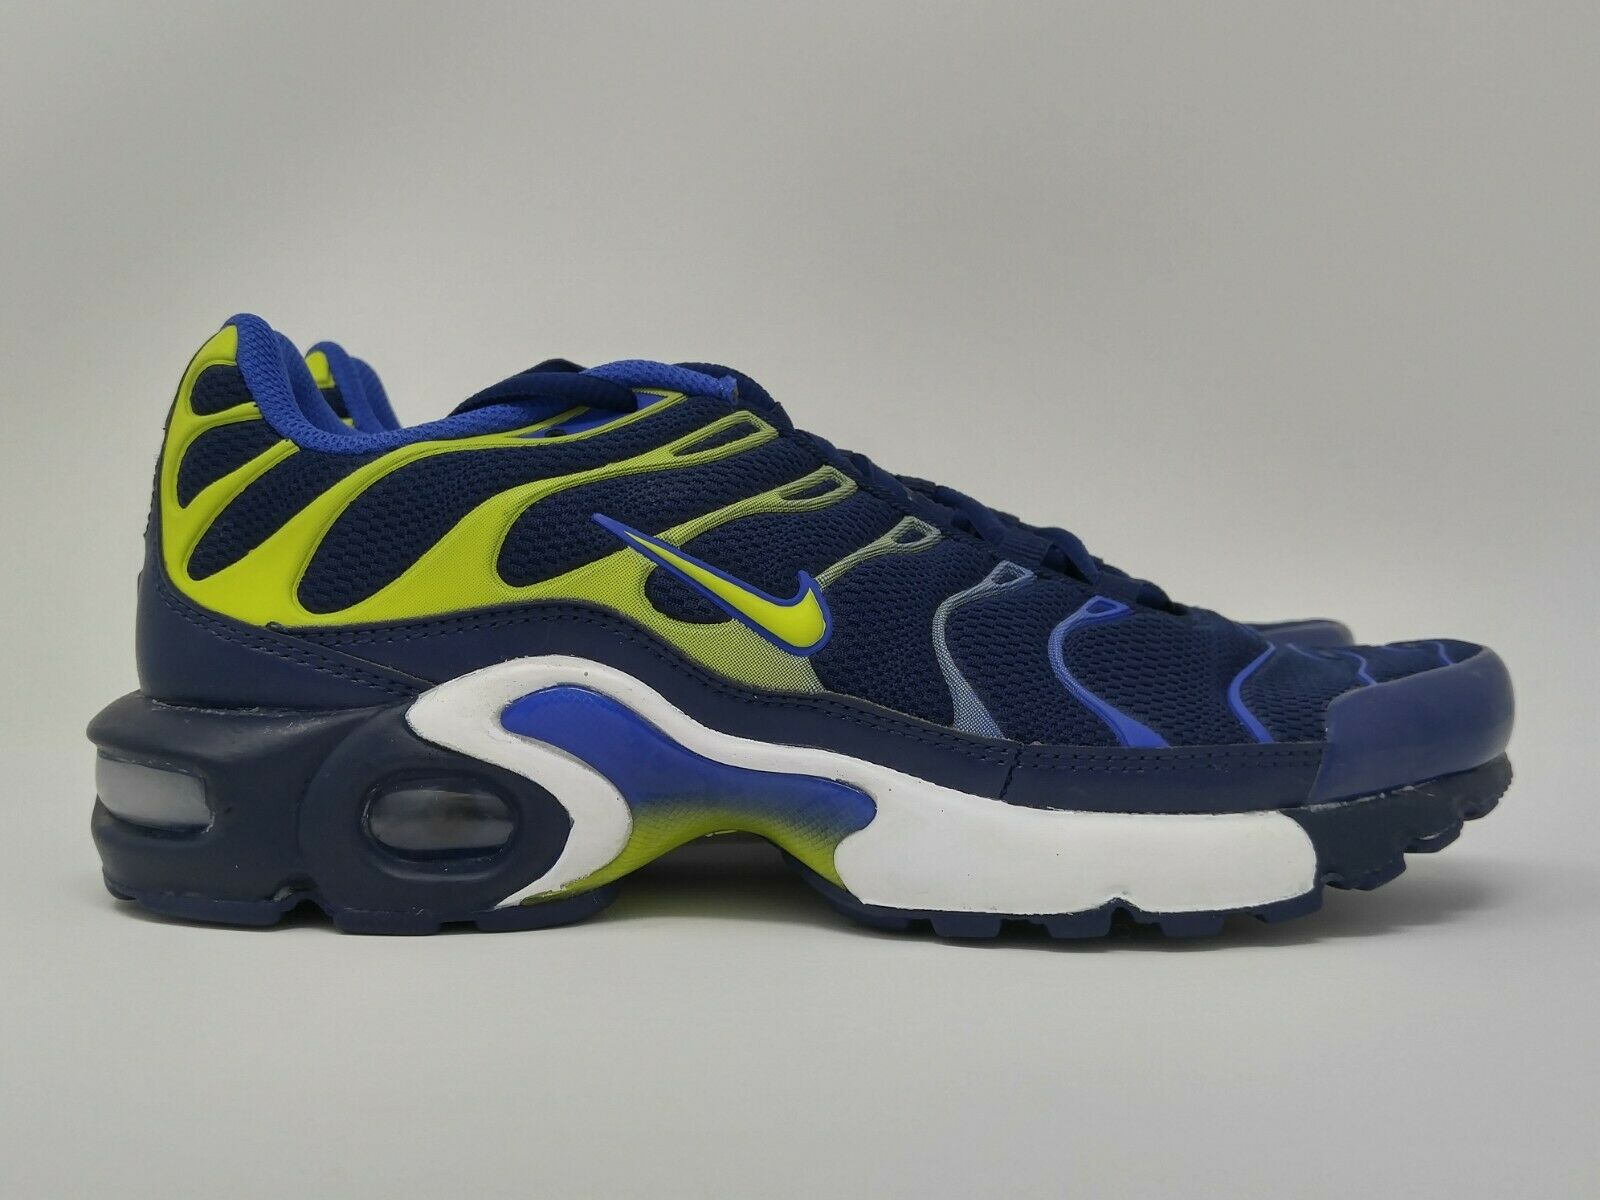 Nike Air Max Plus TN Binary Blue Yellow Neon GS Grade School Size 7Y 655020 407